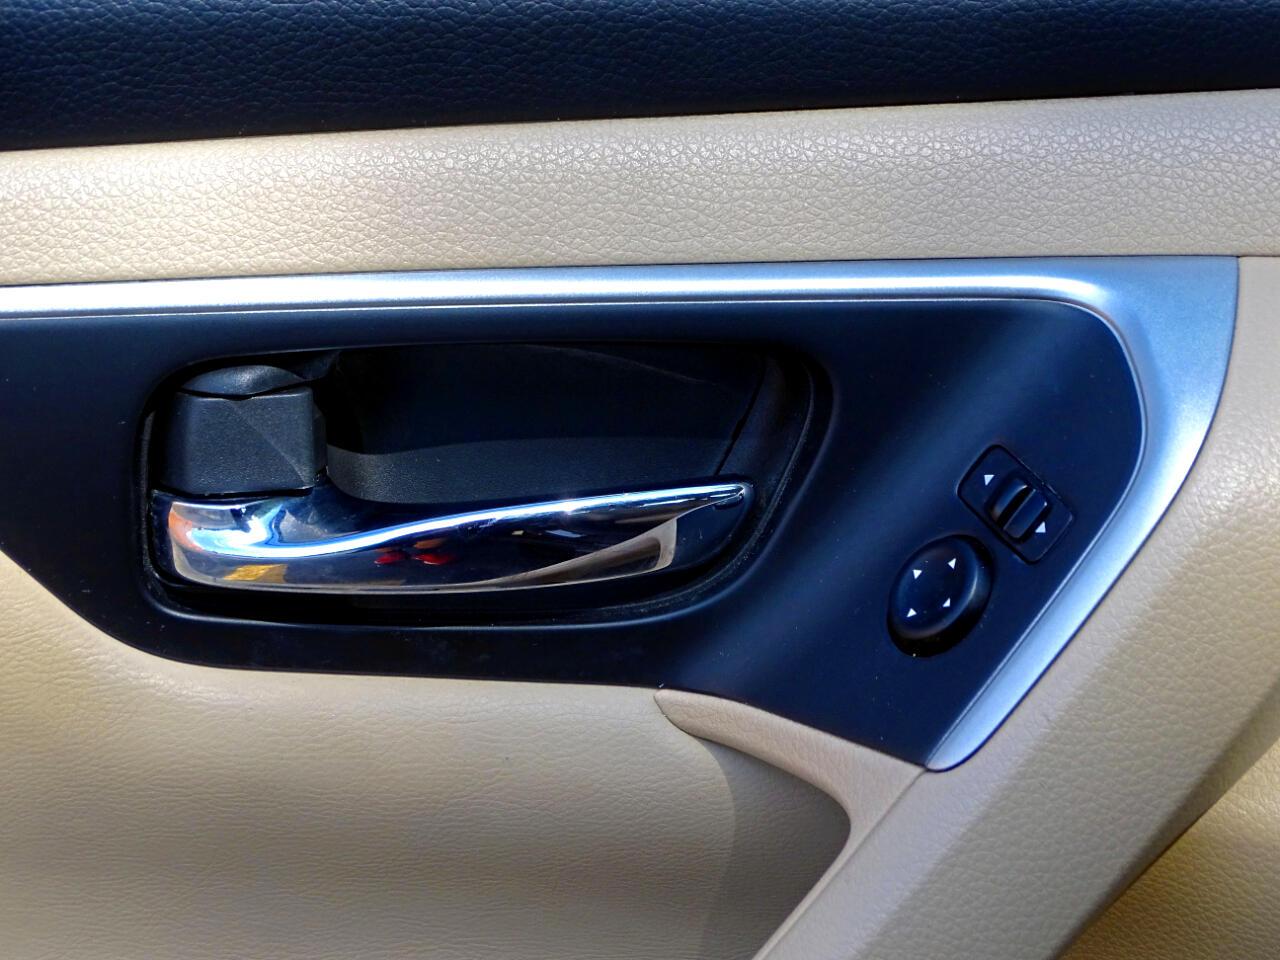 2016 Nissan Altima 4dr Sdn I4 2.5 S